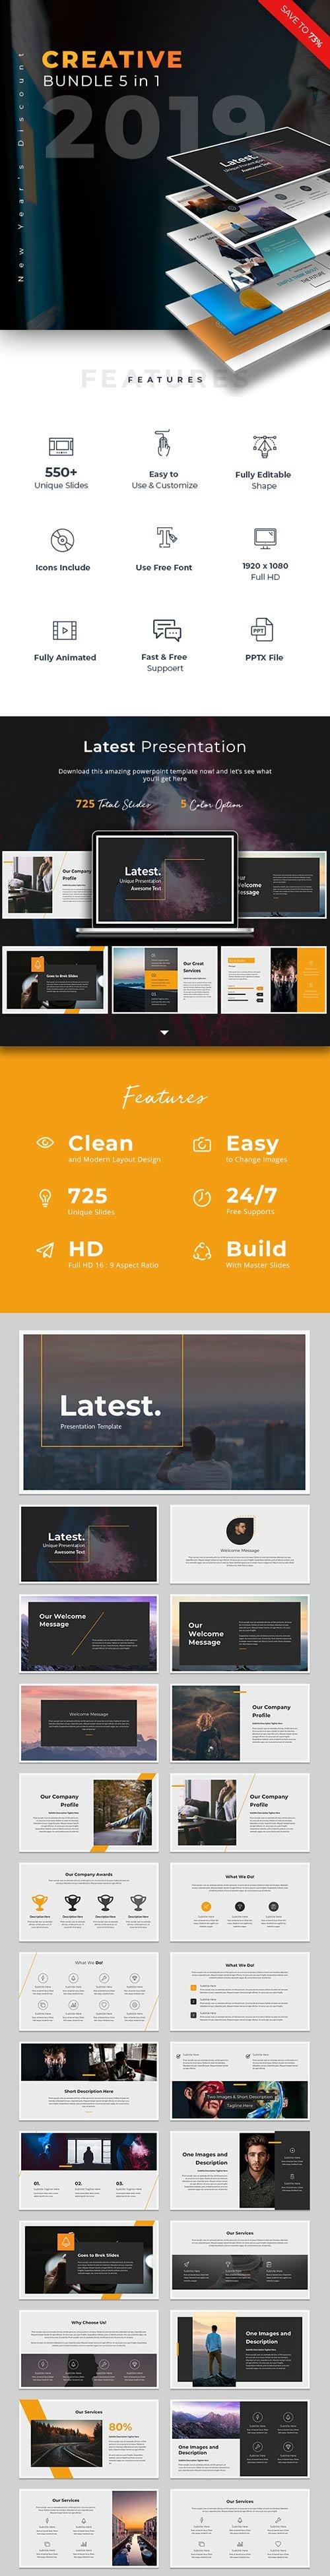 GraphicRiver - Creative Bundle 2019 Powerpoint 23056216